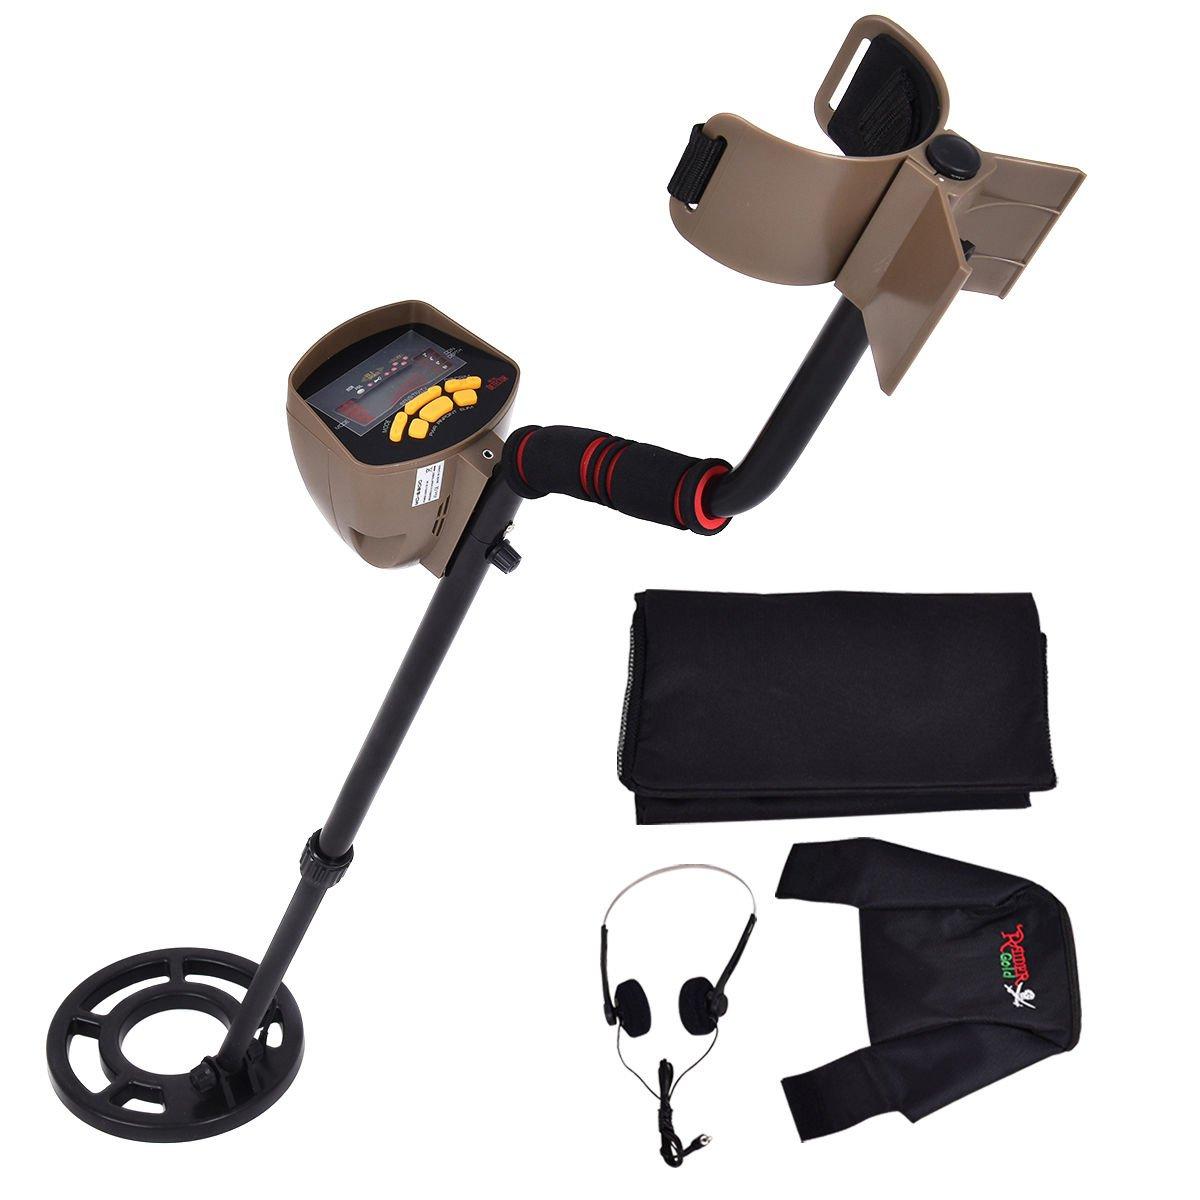 Goplus Metal Detector Waterproof Coil Underground 8.3'' Deep Sensitivity Gold Search 5 Modes w/ Headphone & Backpack MD-6300